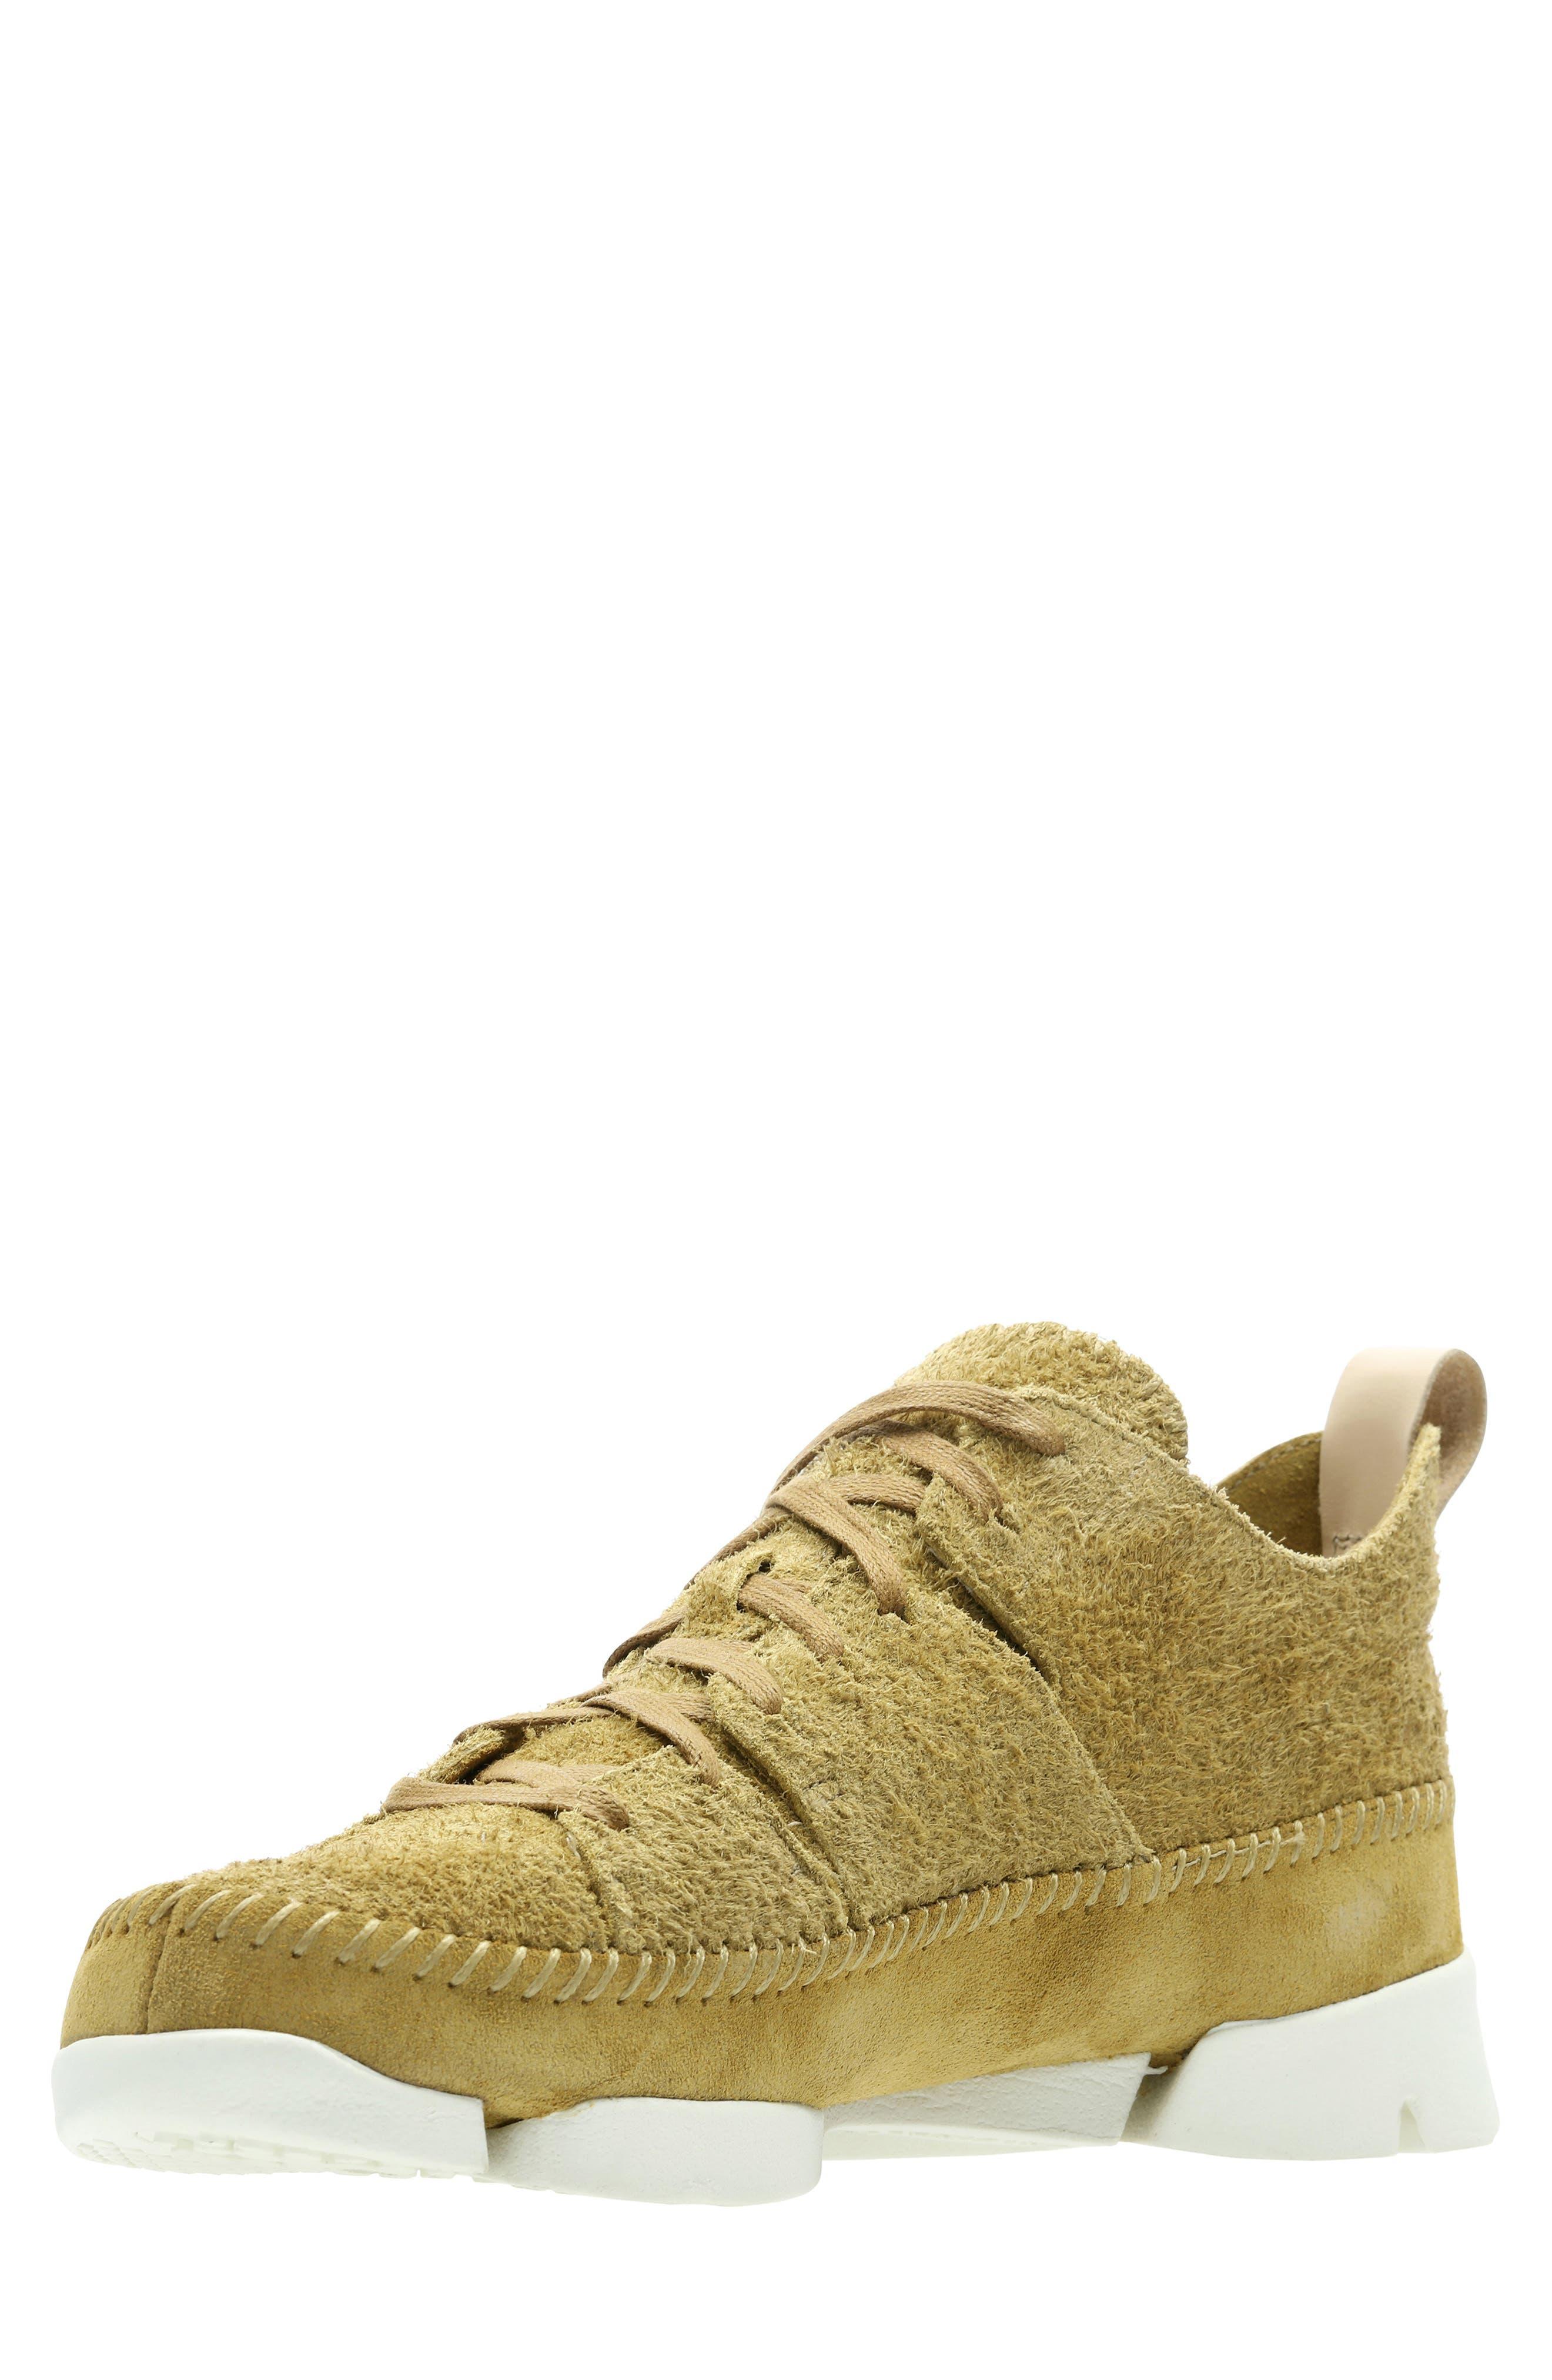 'Trigenic Flex' Leather Sneaker,                             Alternate thumbnail 6, color,                             271